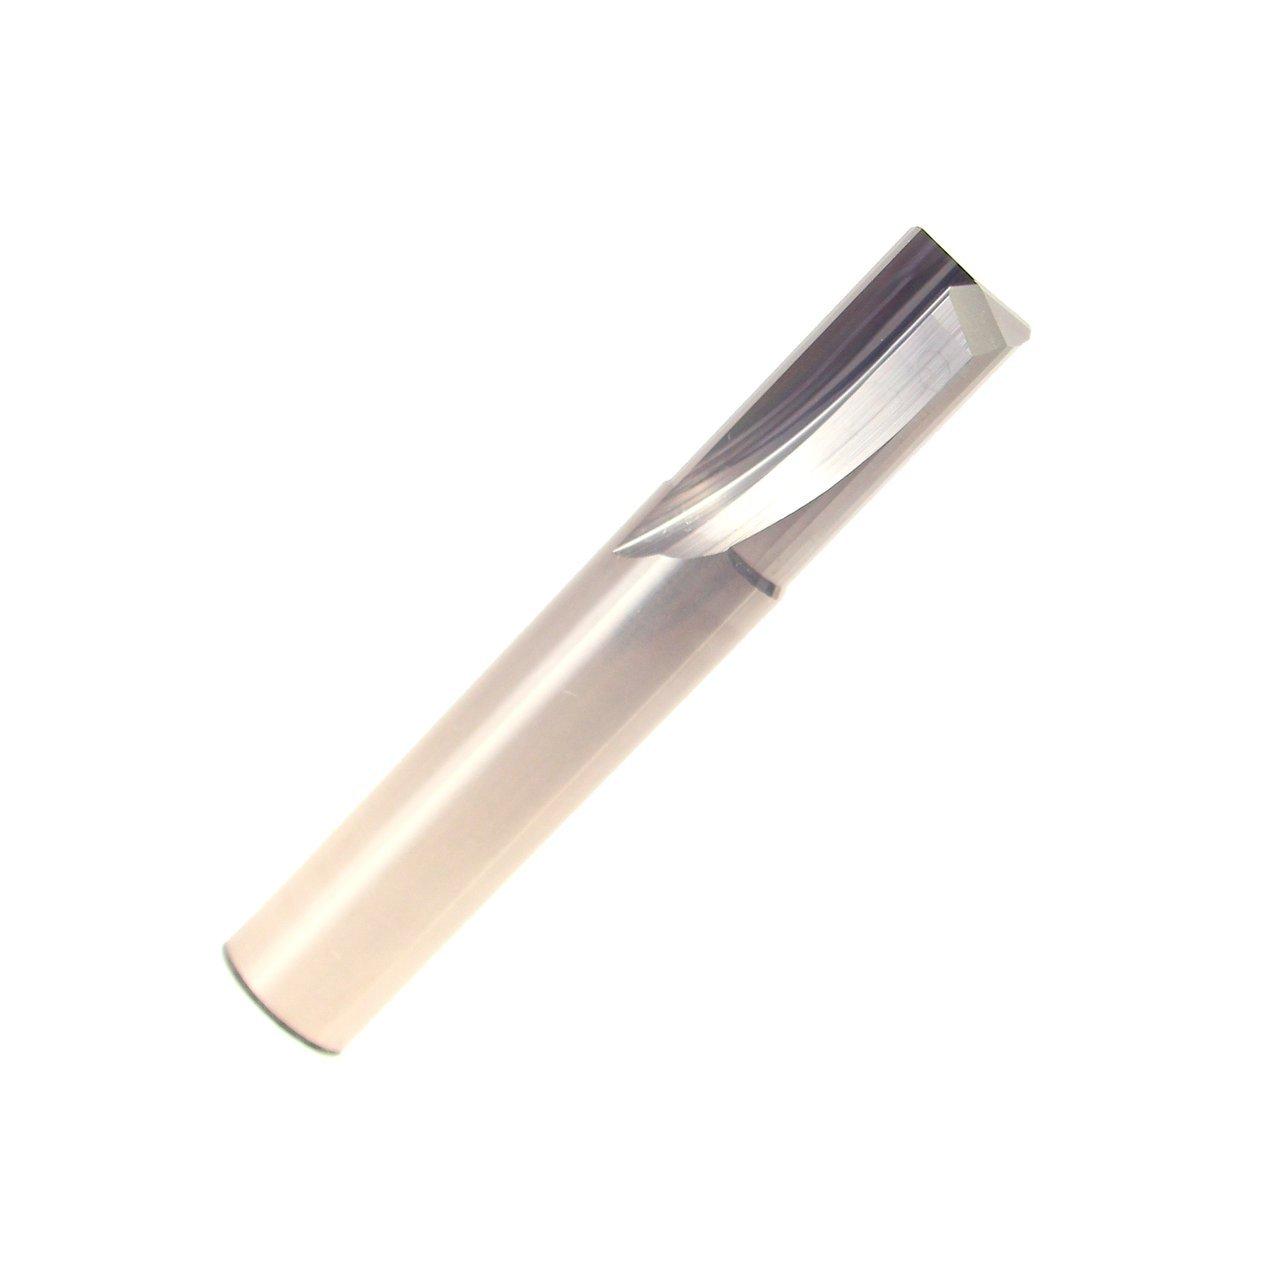 Drill America CBD 3//16 Carbide Chatterless Countersink 6 Flute 82 Degree